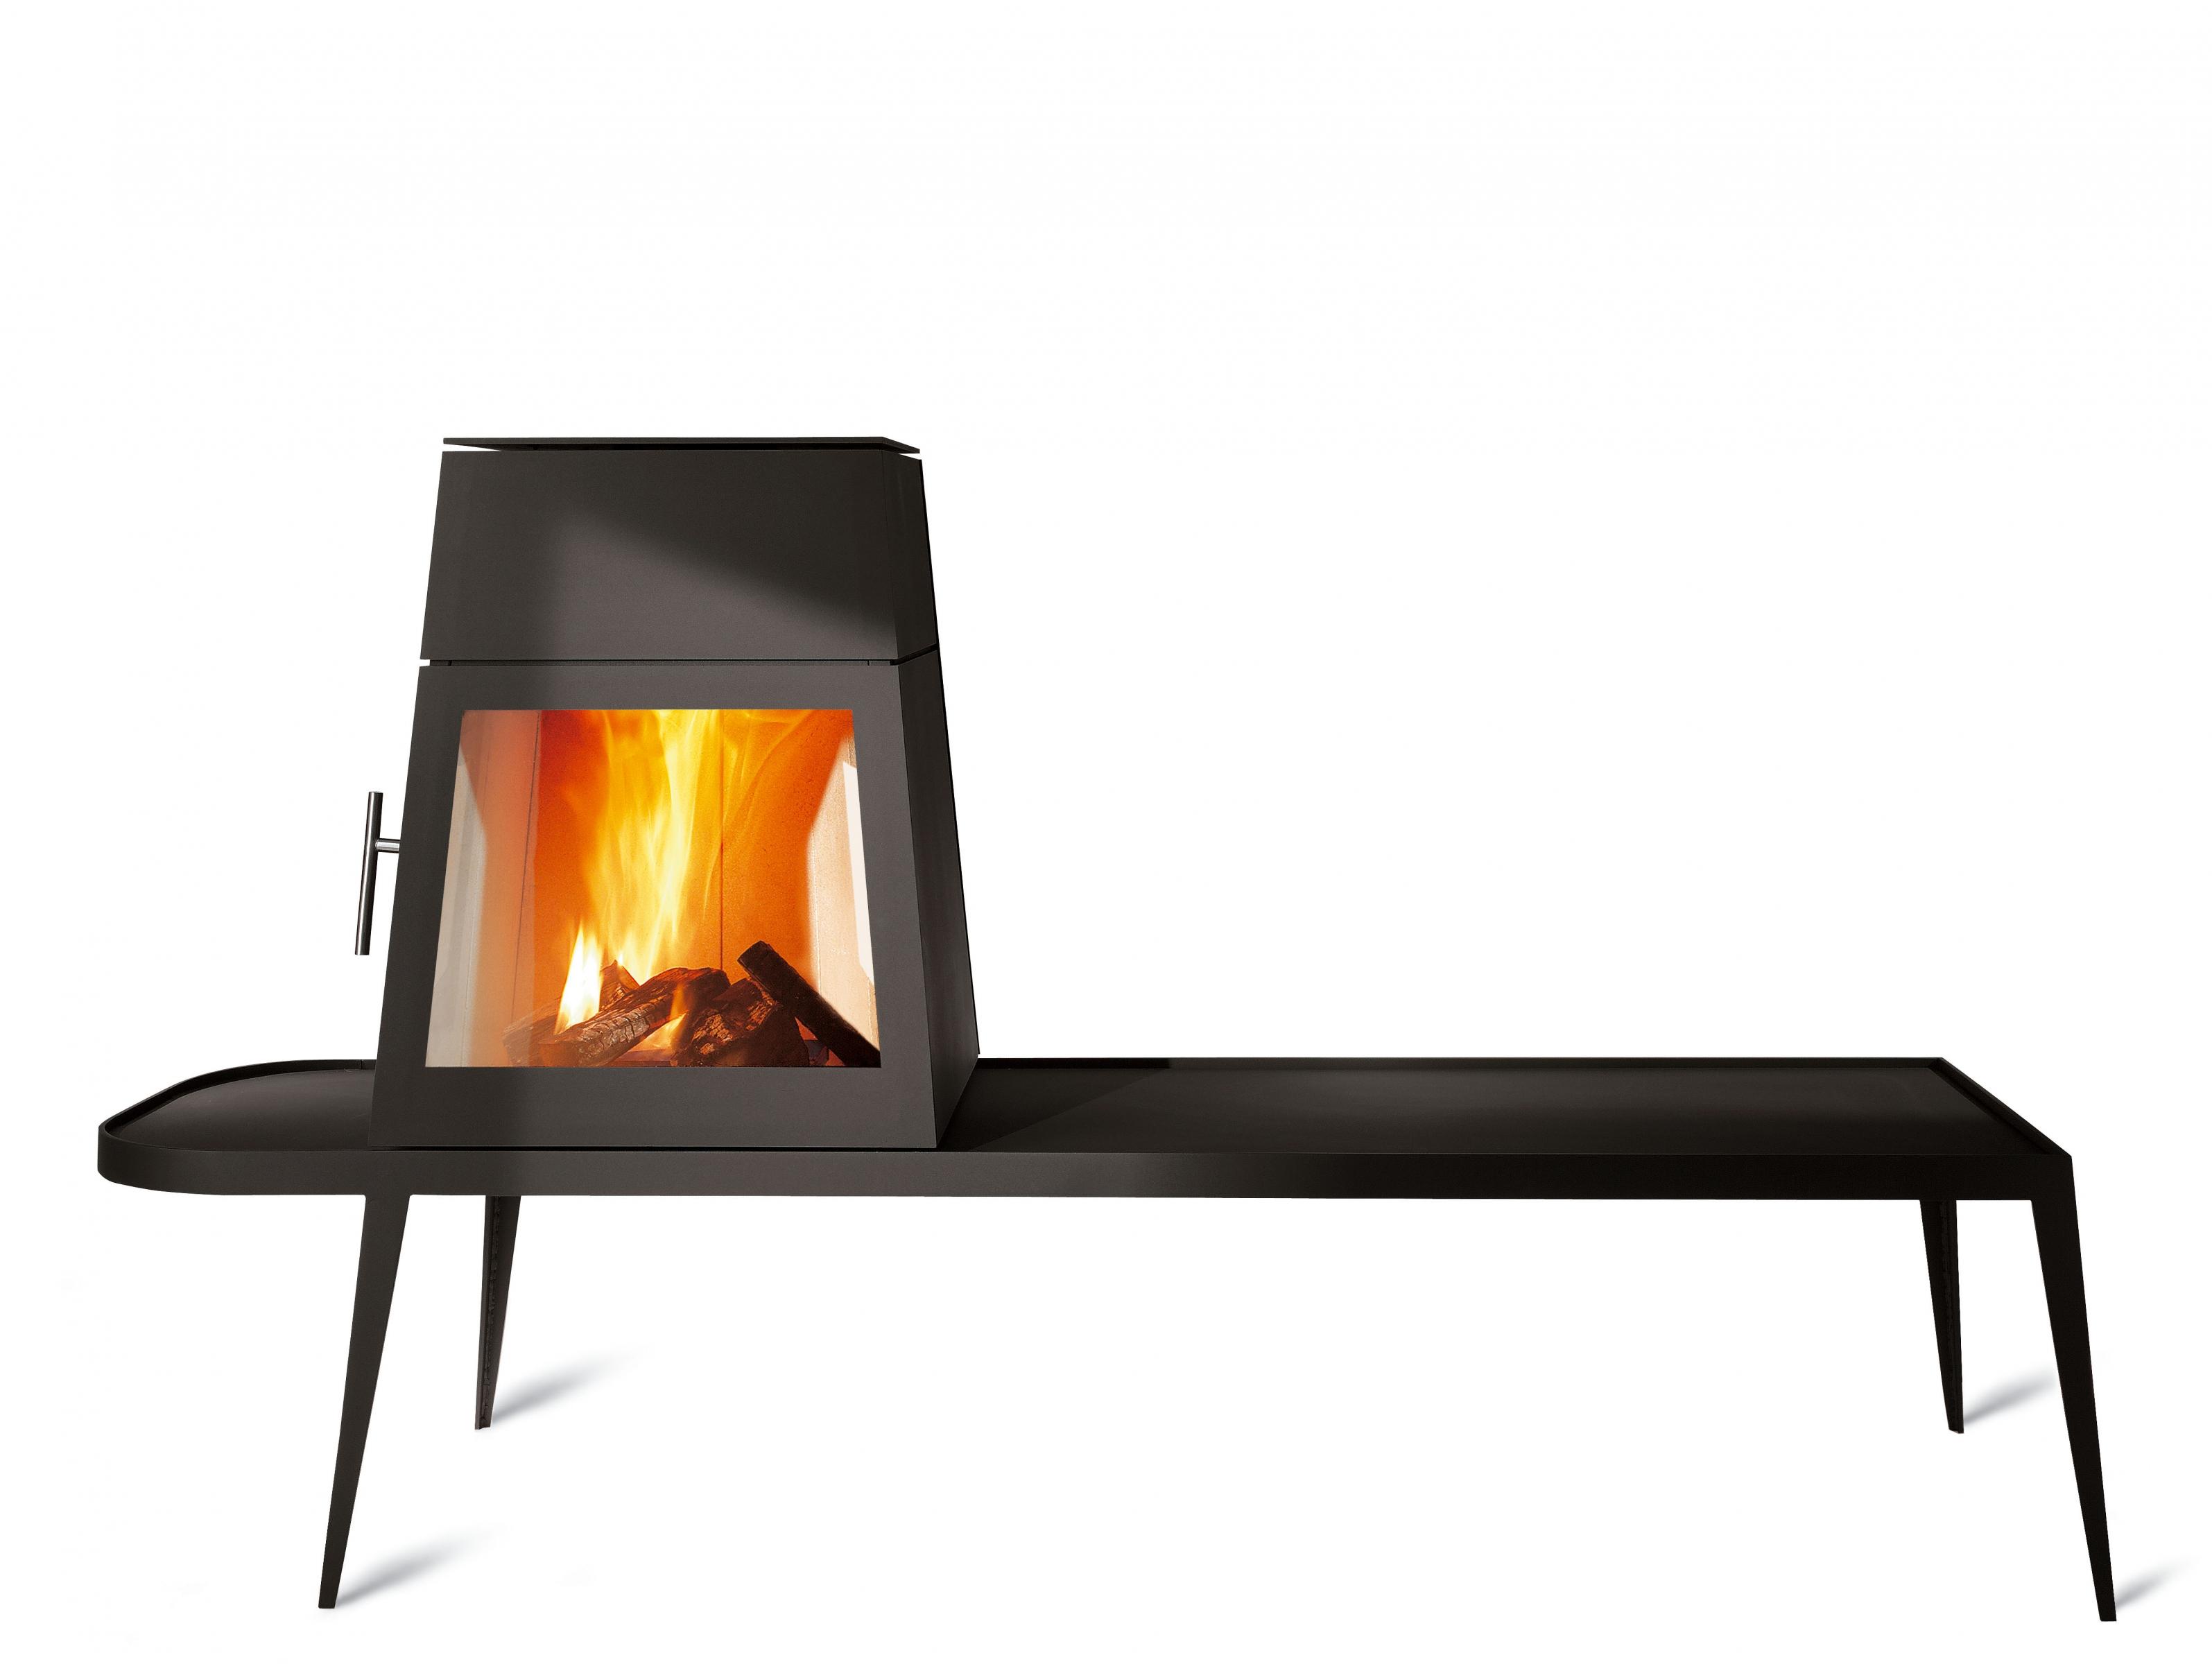 shaker r f chauffage po les bois design espace po le scandinave. Black Bedroom Furniture Sets. Home Design Ideas